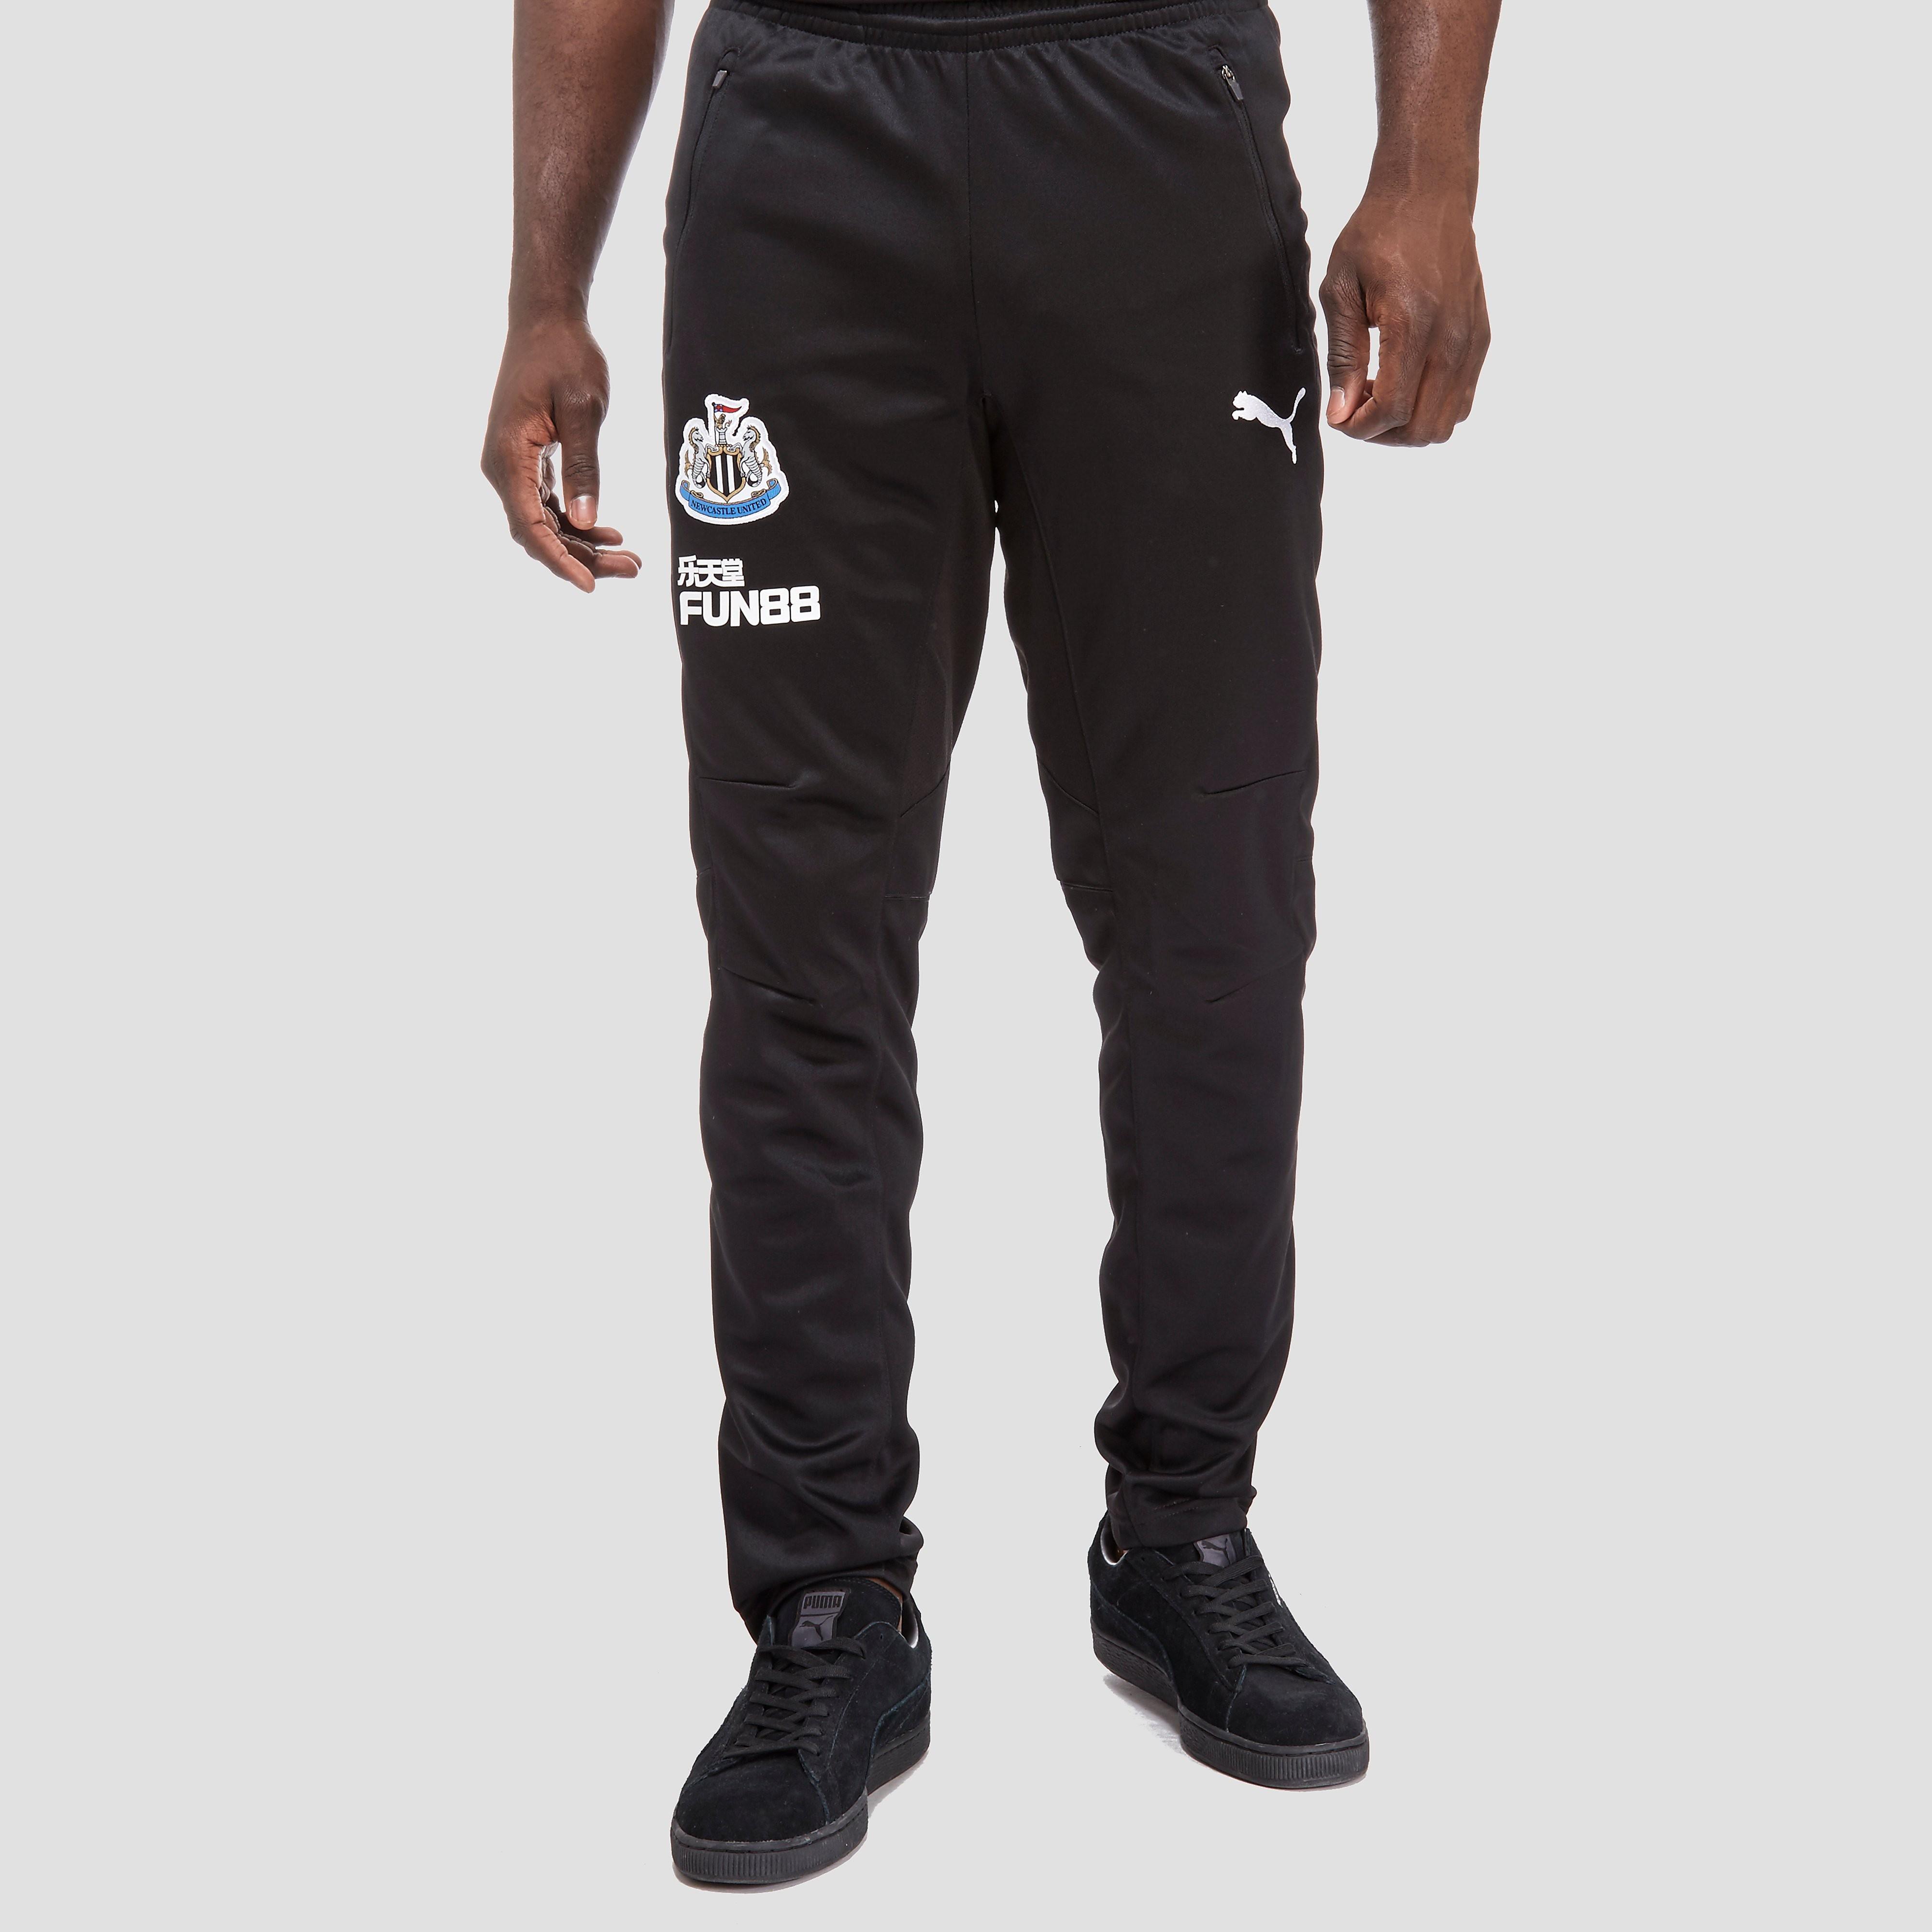 PUMA Newcastle United 2017 Training Pants